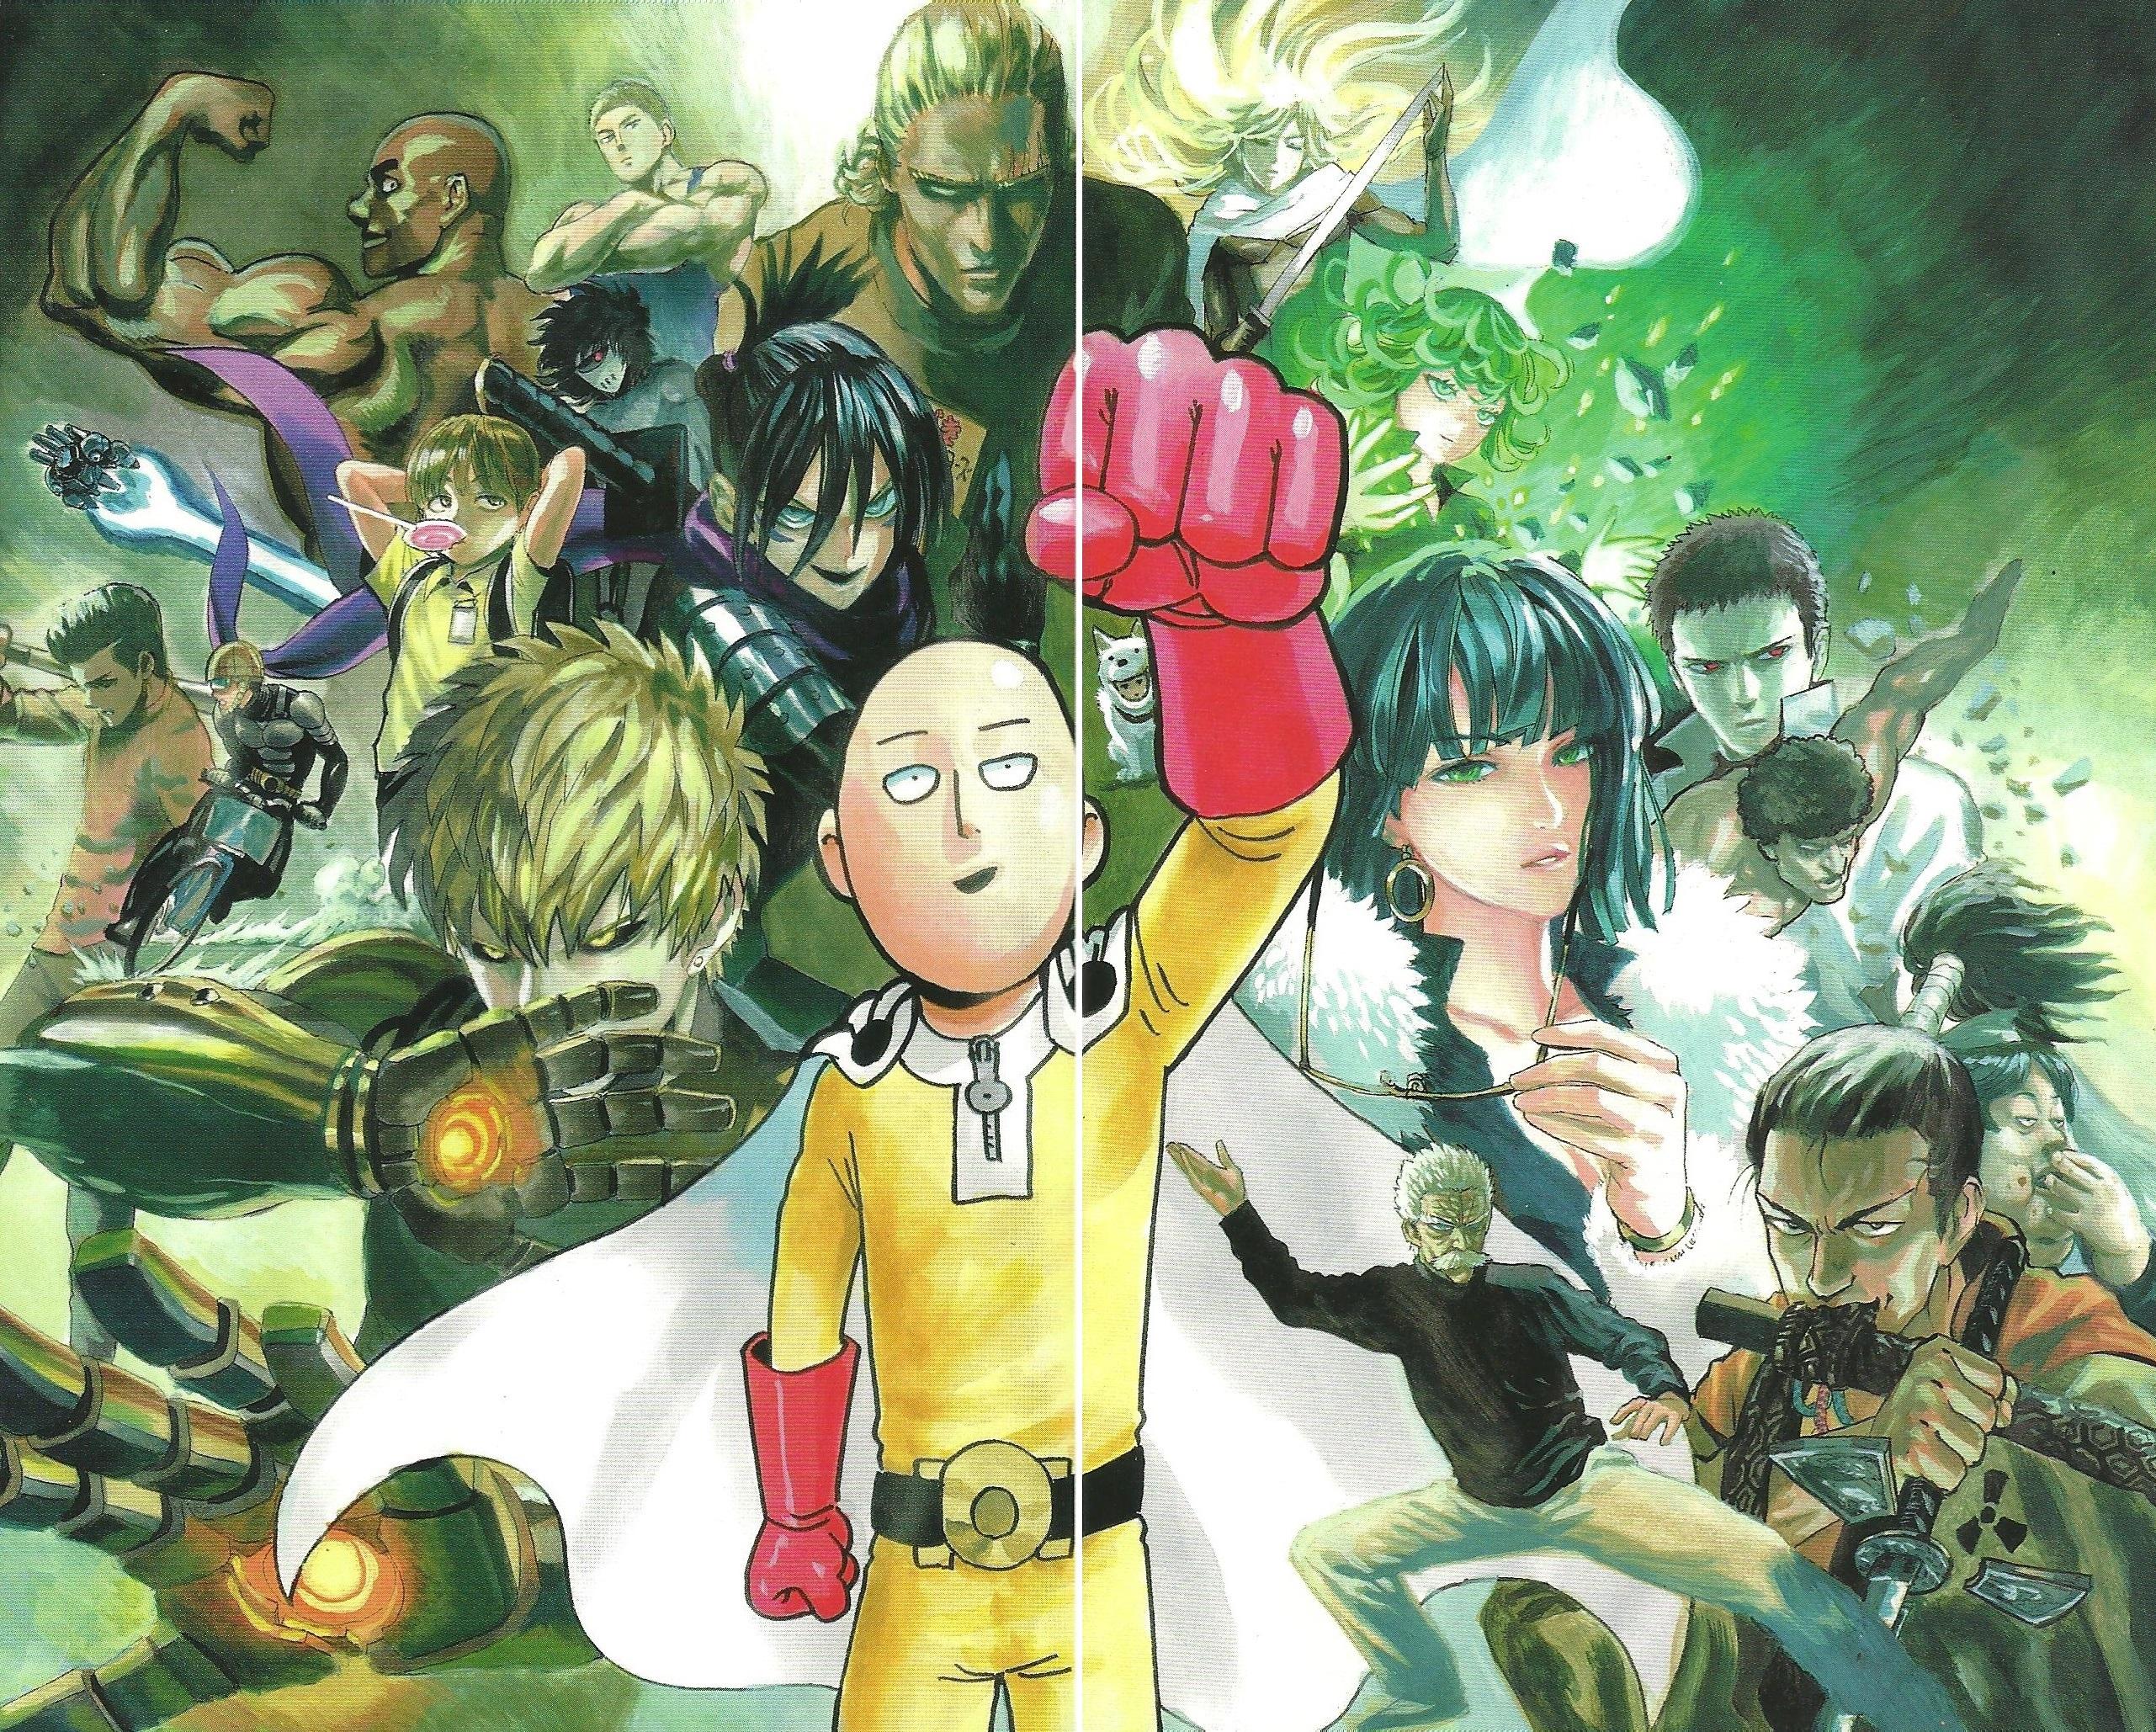 Wallpaper One Punch Man Yusuke Murata Saitama Genos